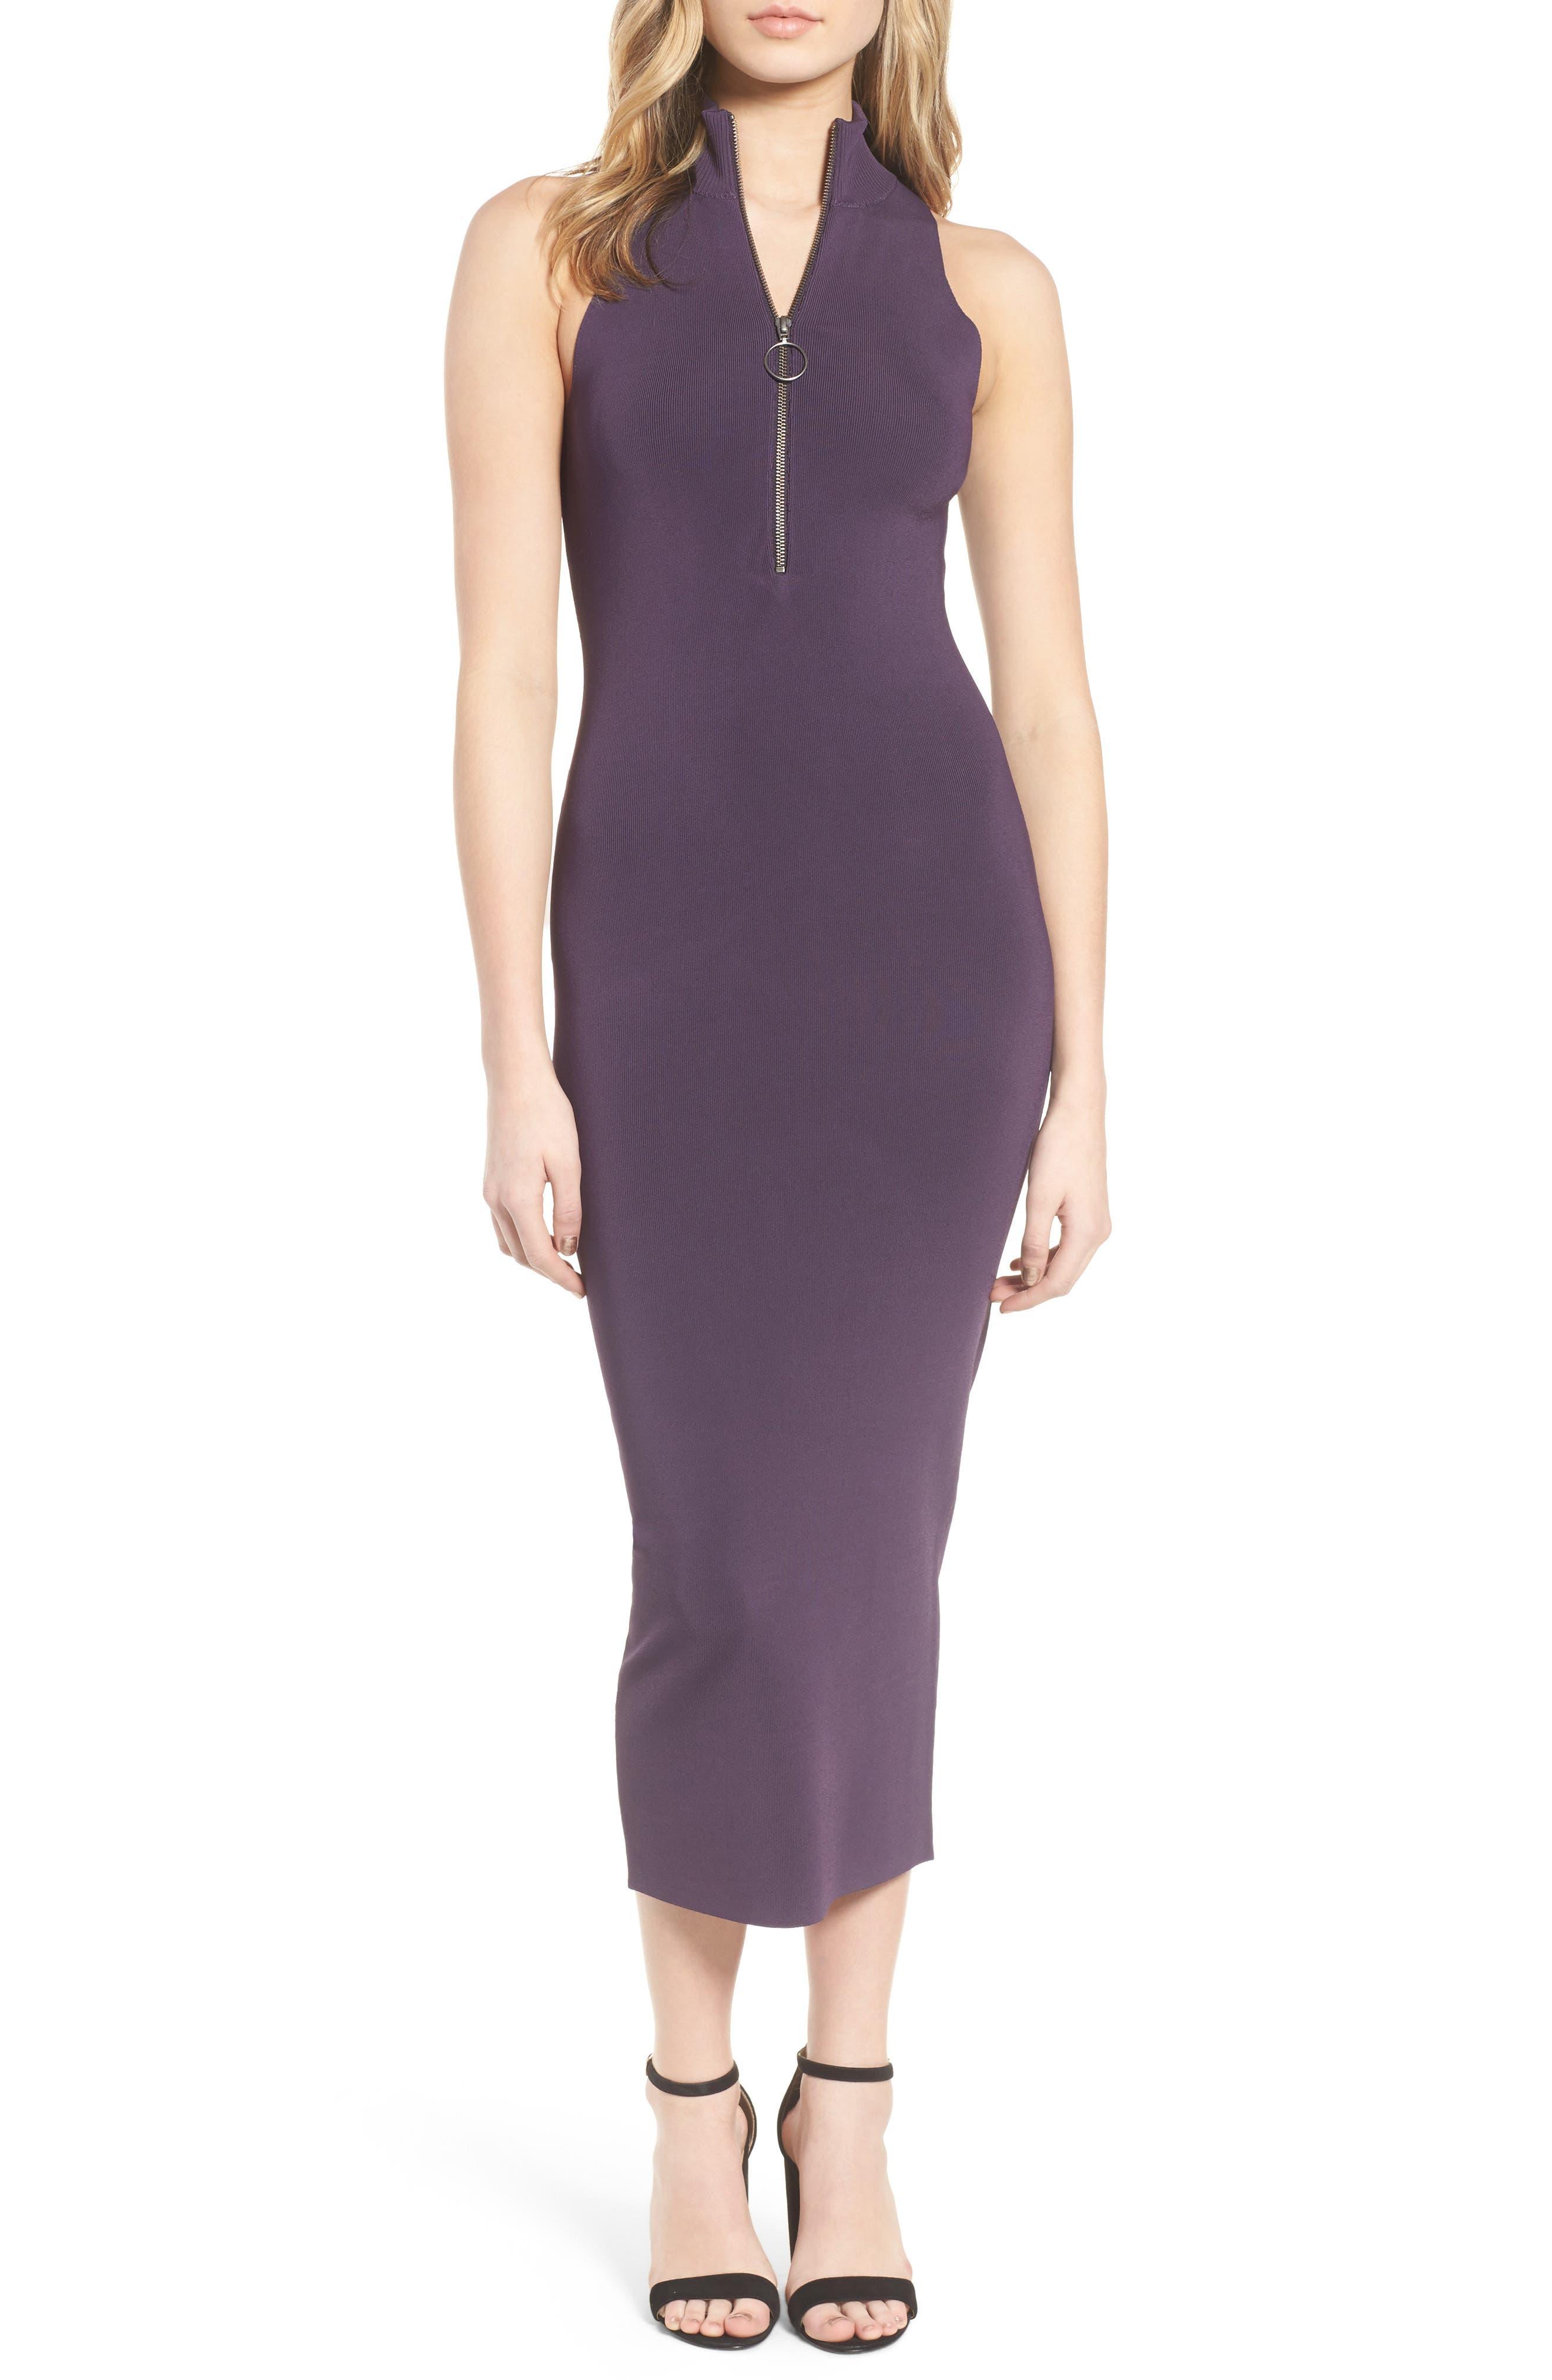 Sweater Knit Midi Dress,                             Main thumbnail 1, color,                             Purple Night